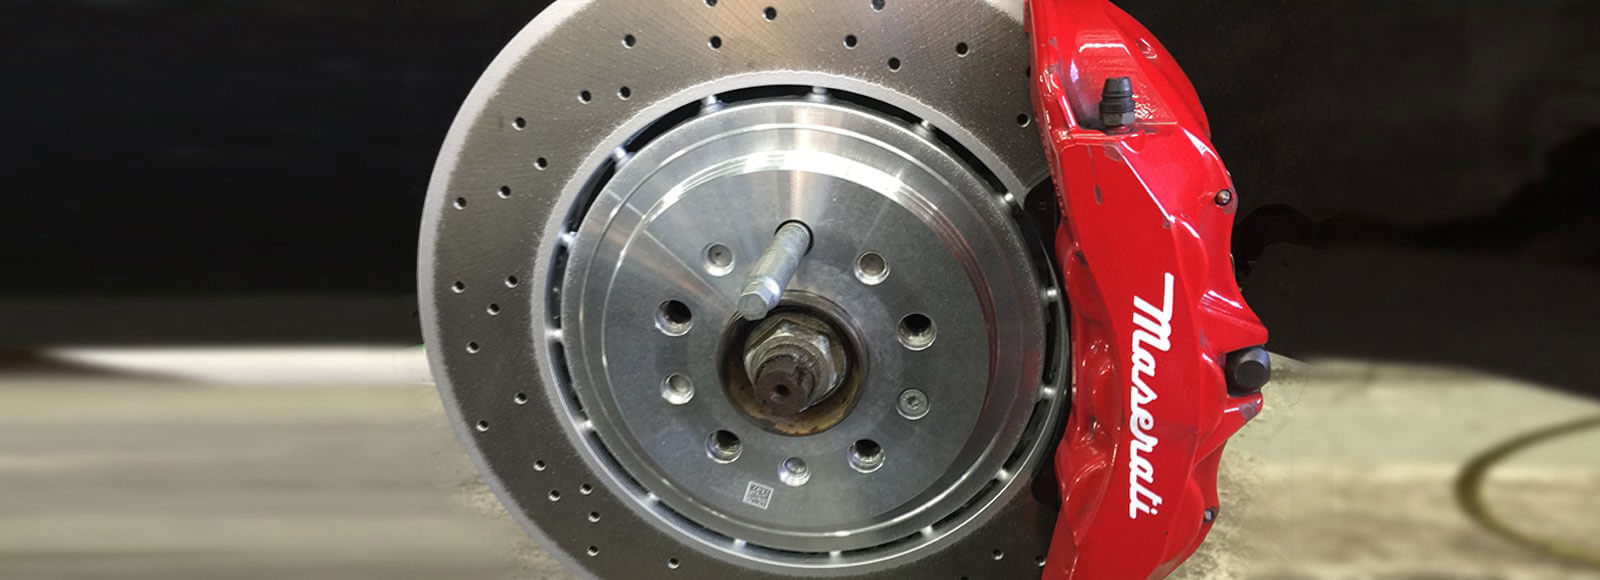 Auto Repair Boulder Co Engine Brake Transmission